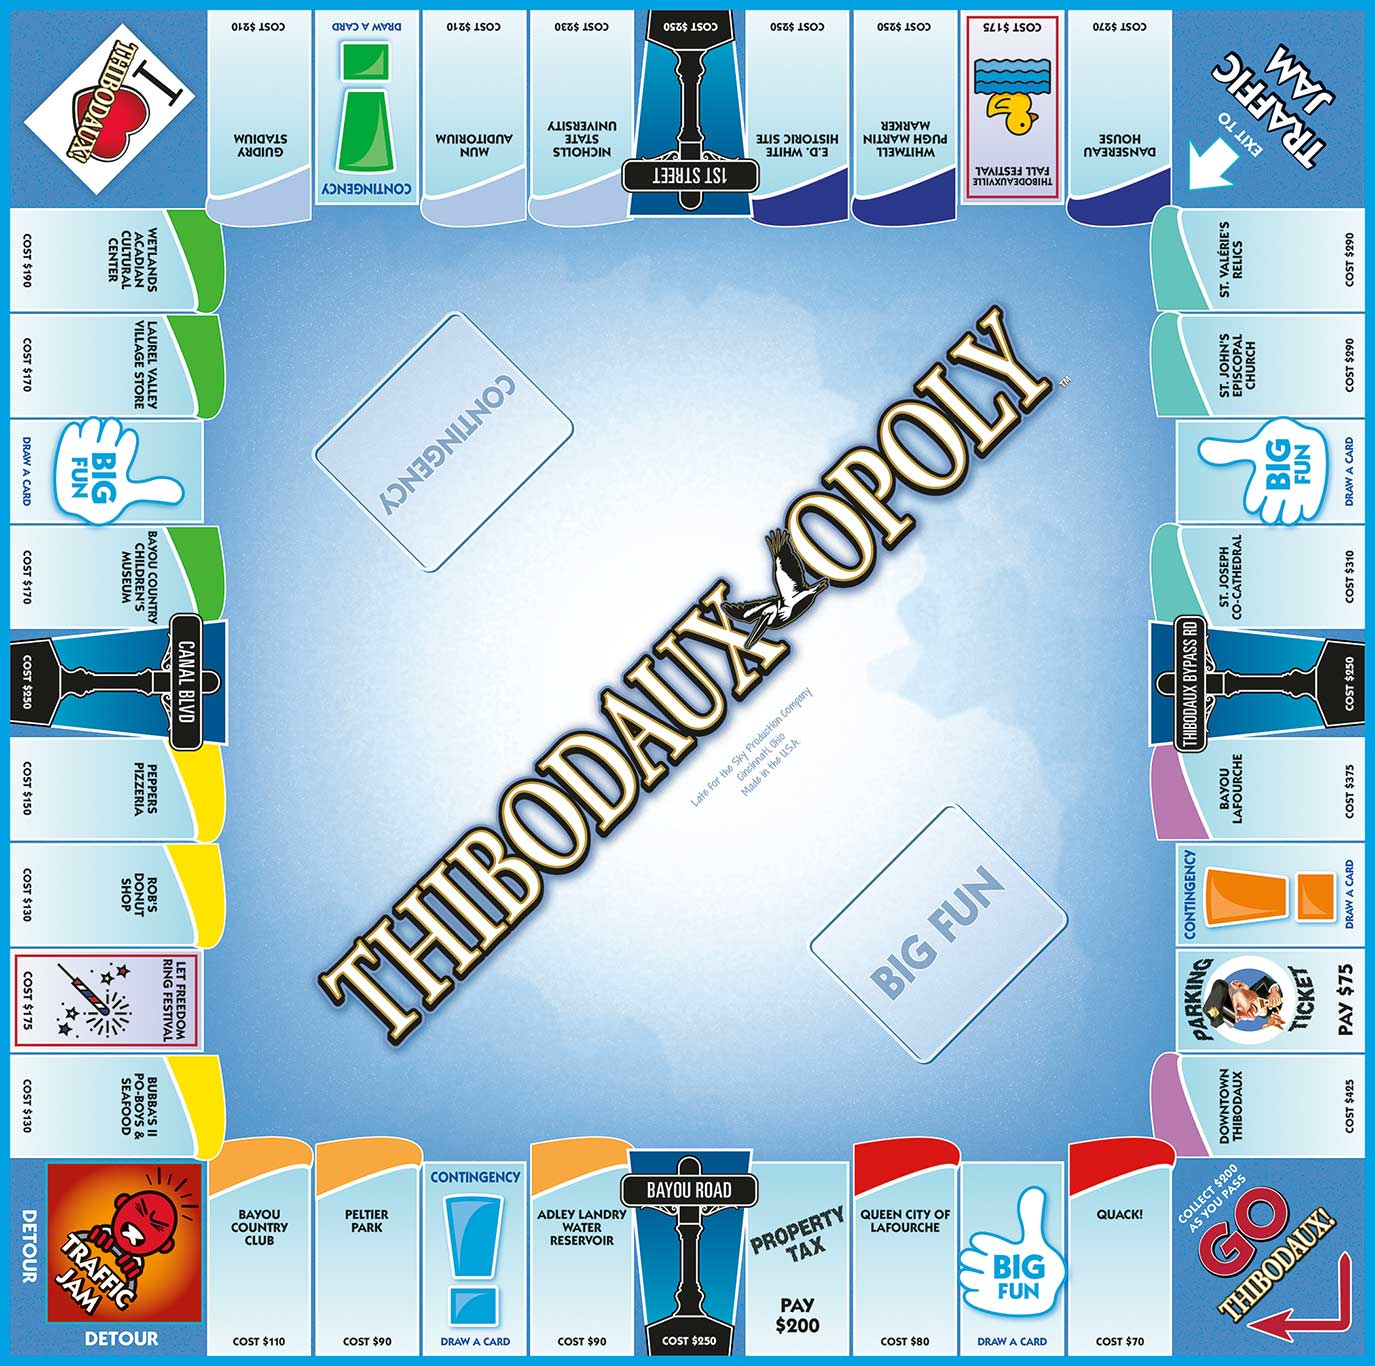 THIBODAUX-OPOLY Board Game